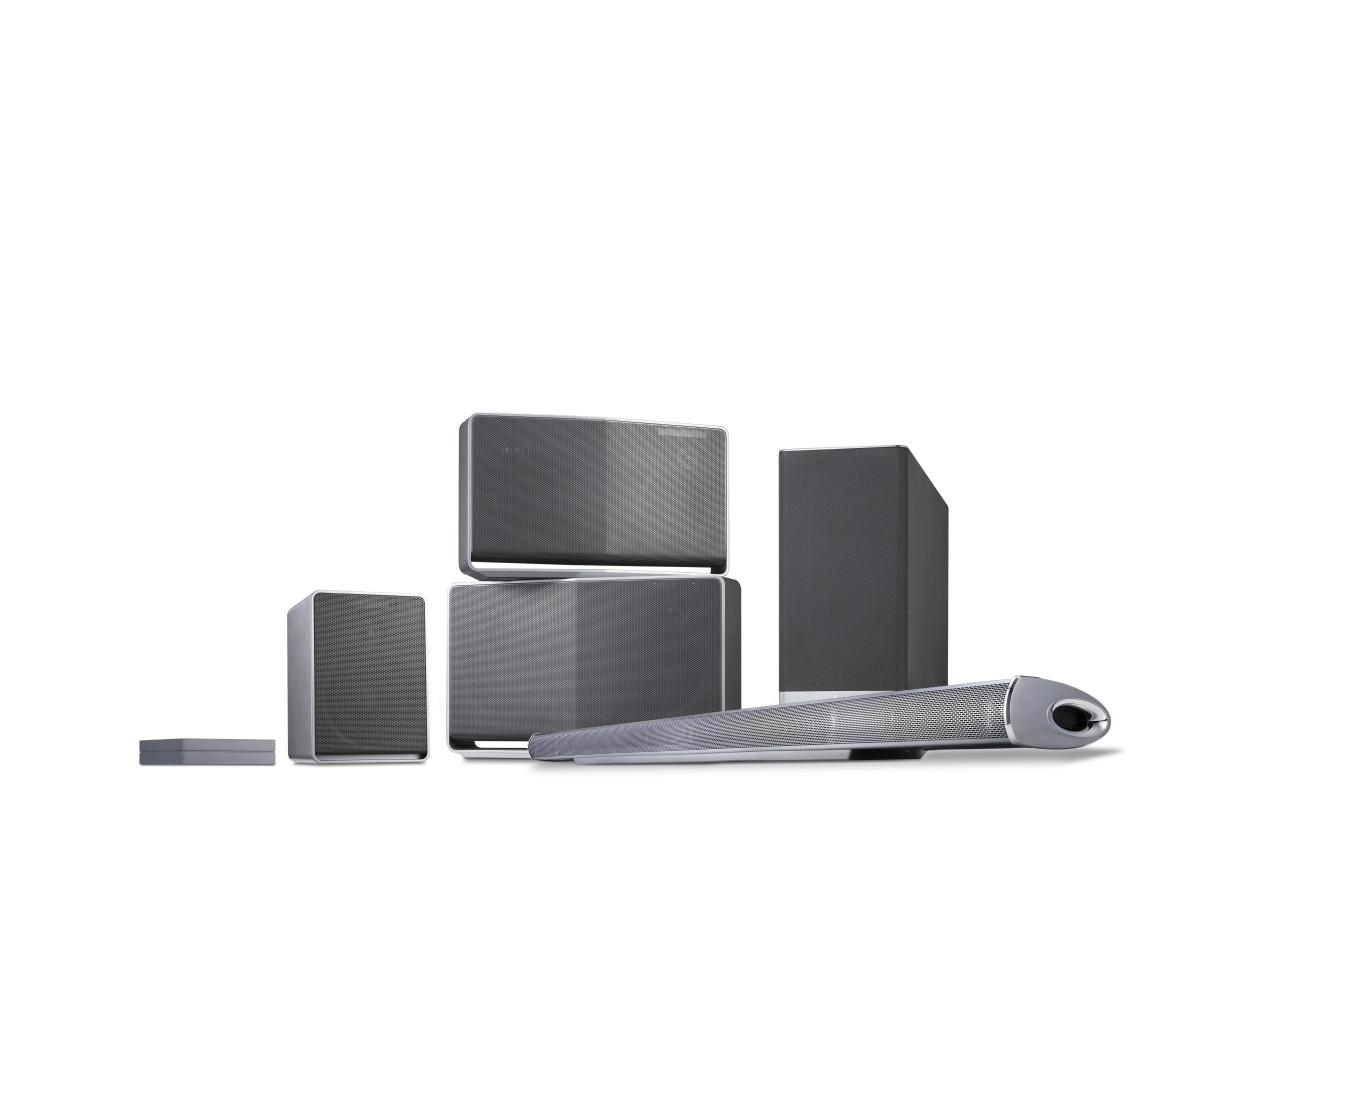 H3 (NP8340) - Smart Hi-Fi Wireless Network Speaker | LG